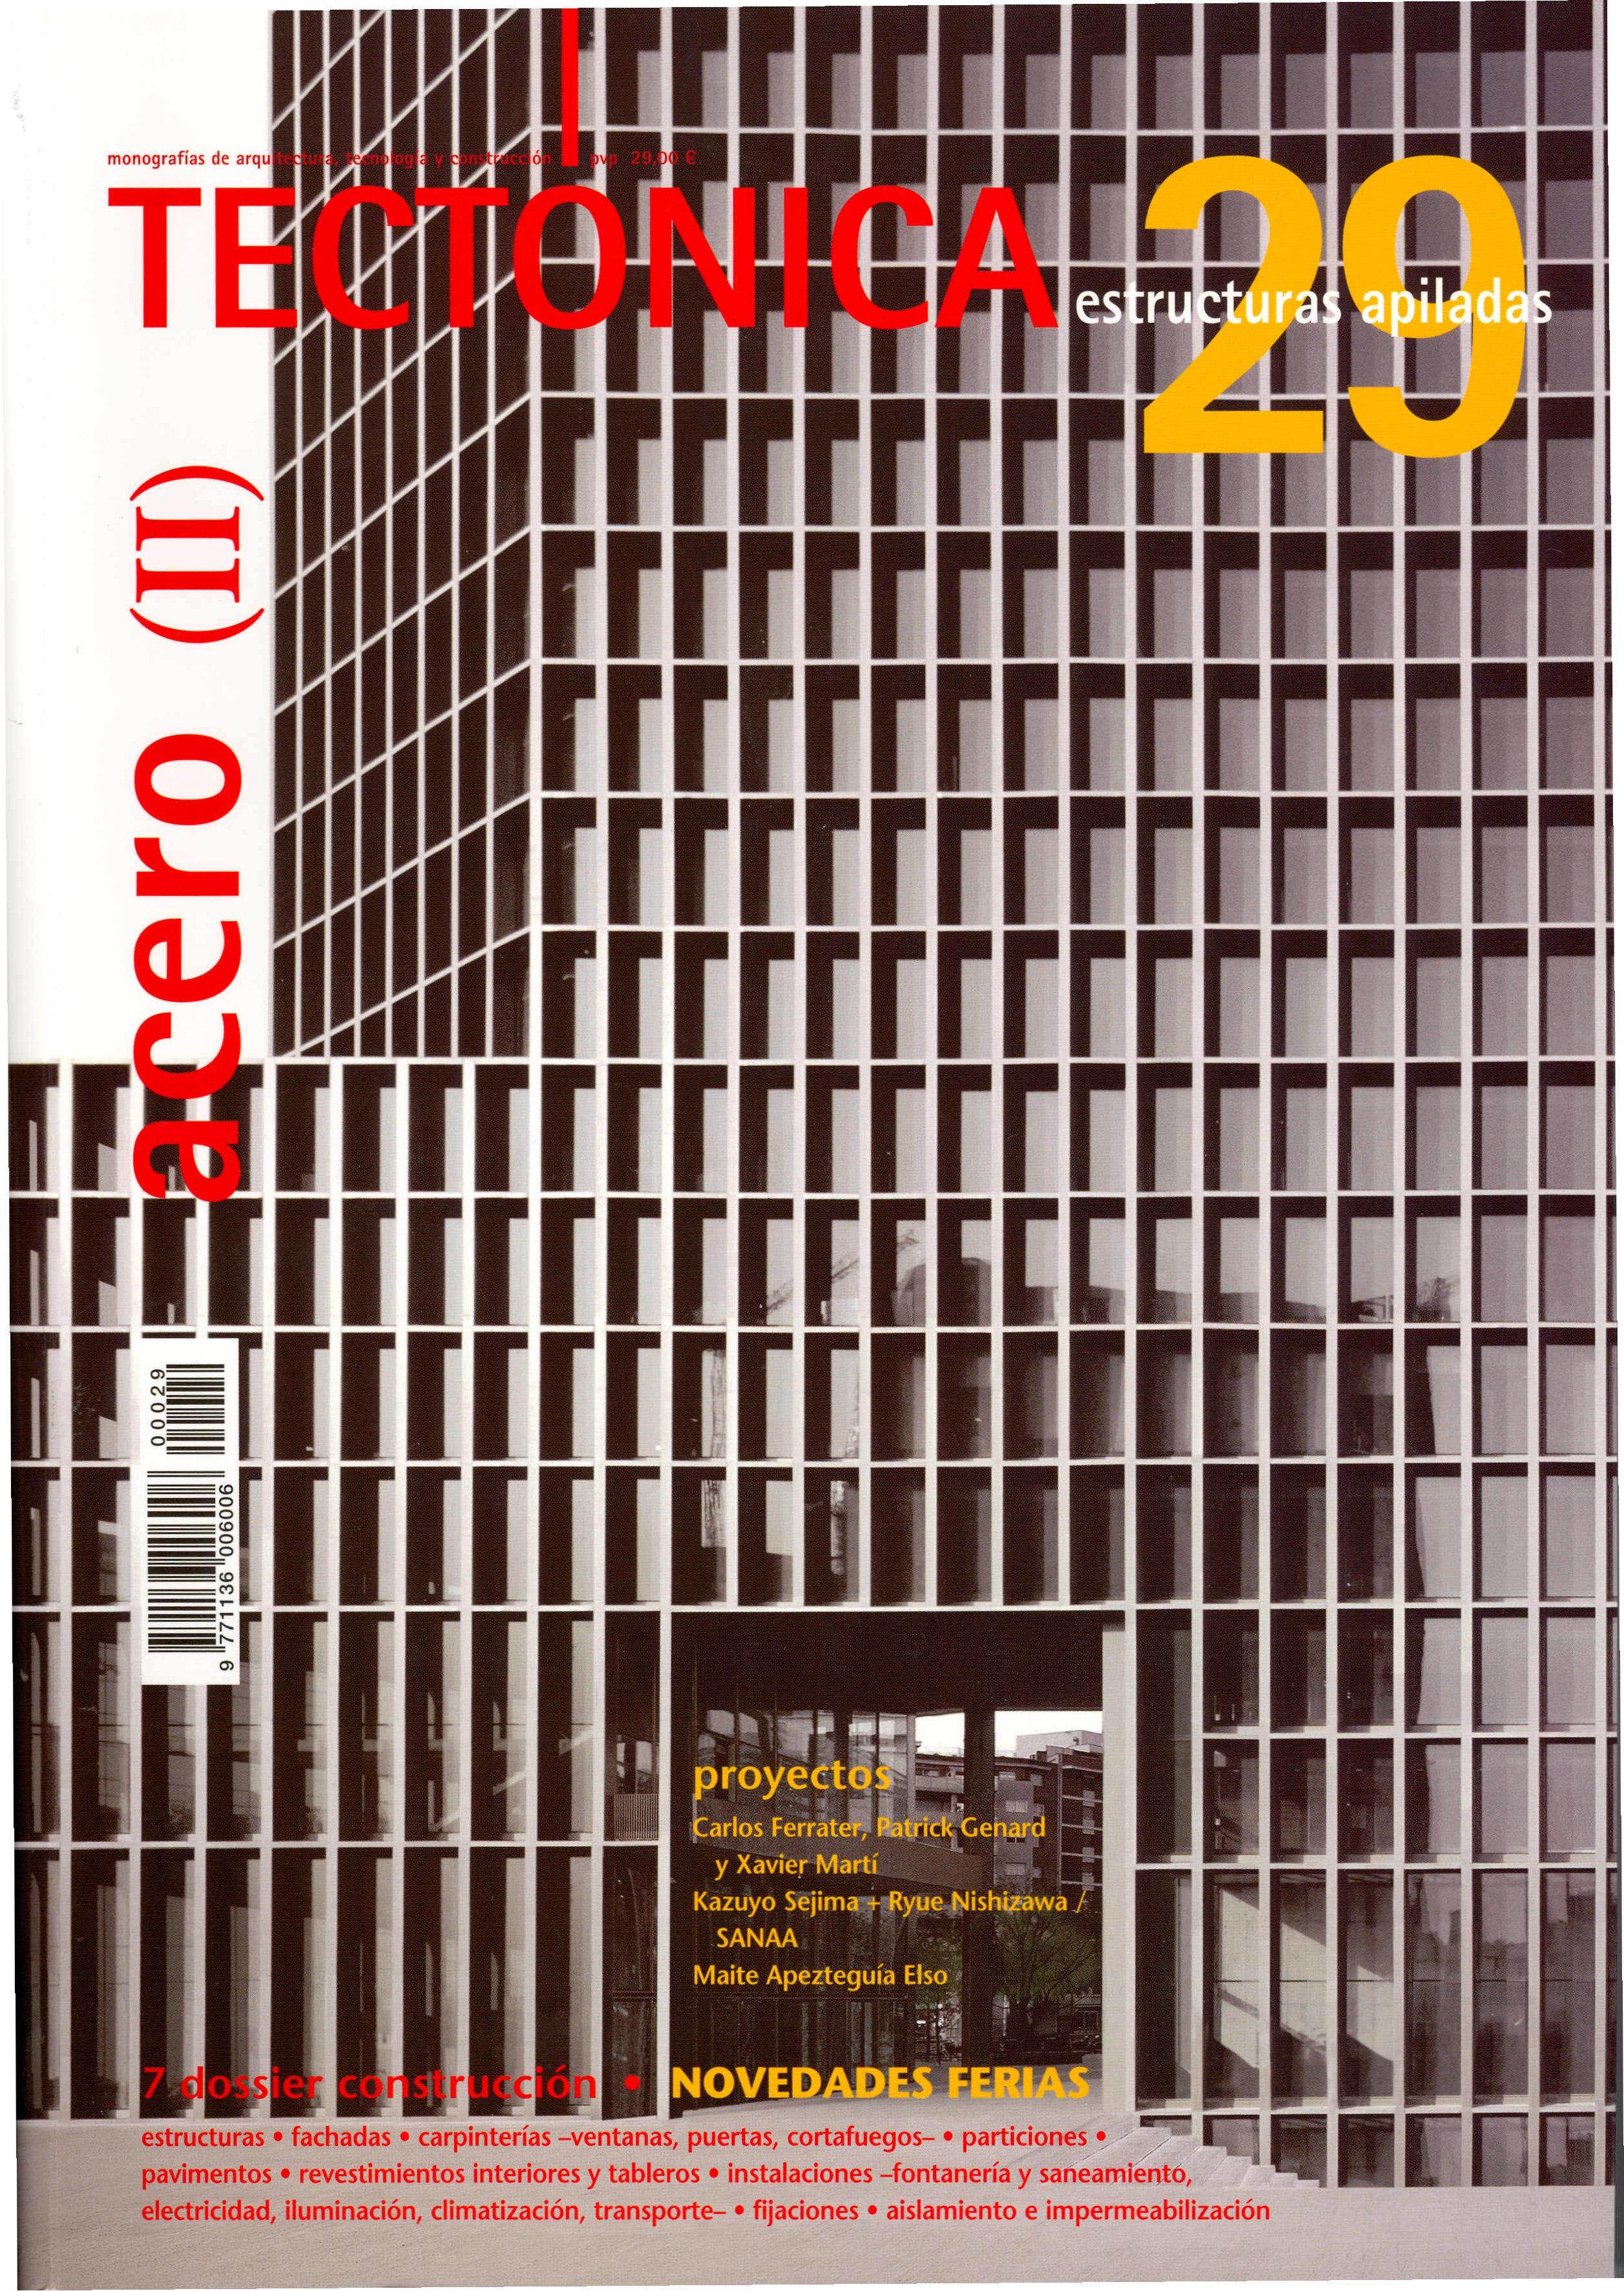 Nuevo Museo0001_Page_01.jpg